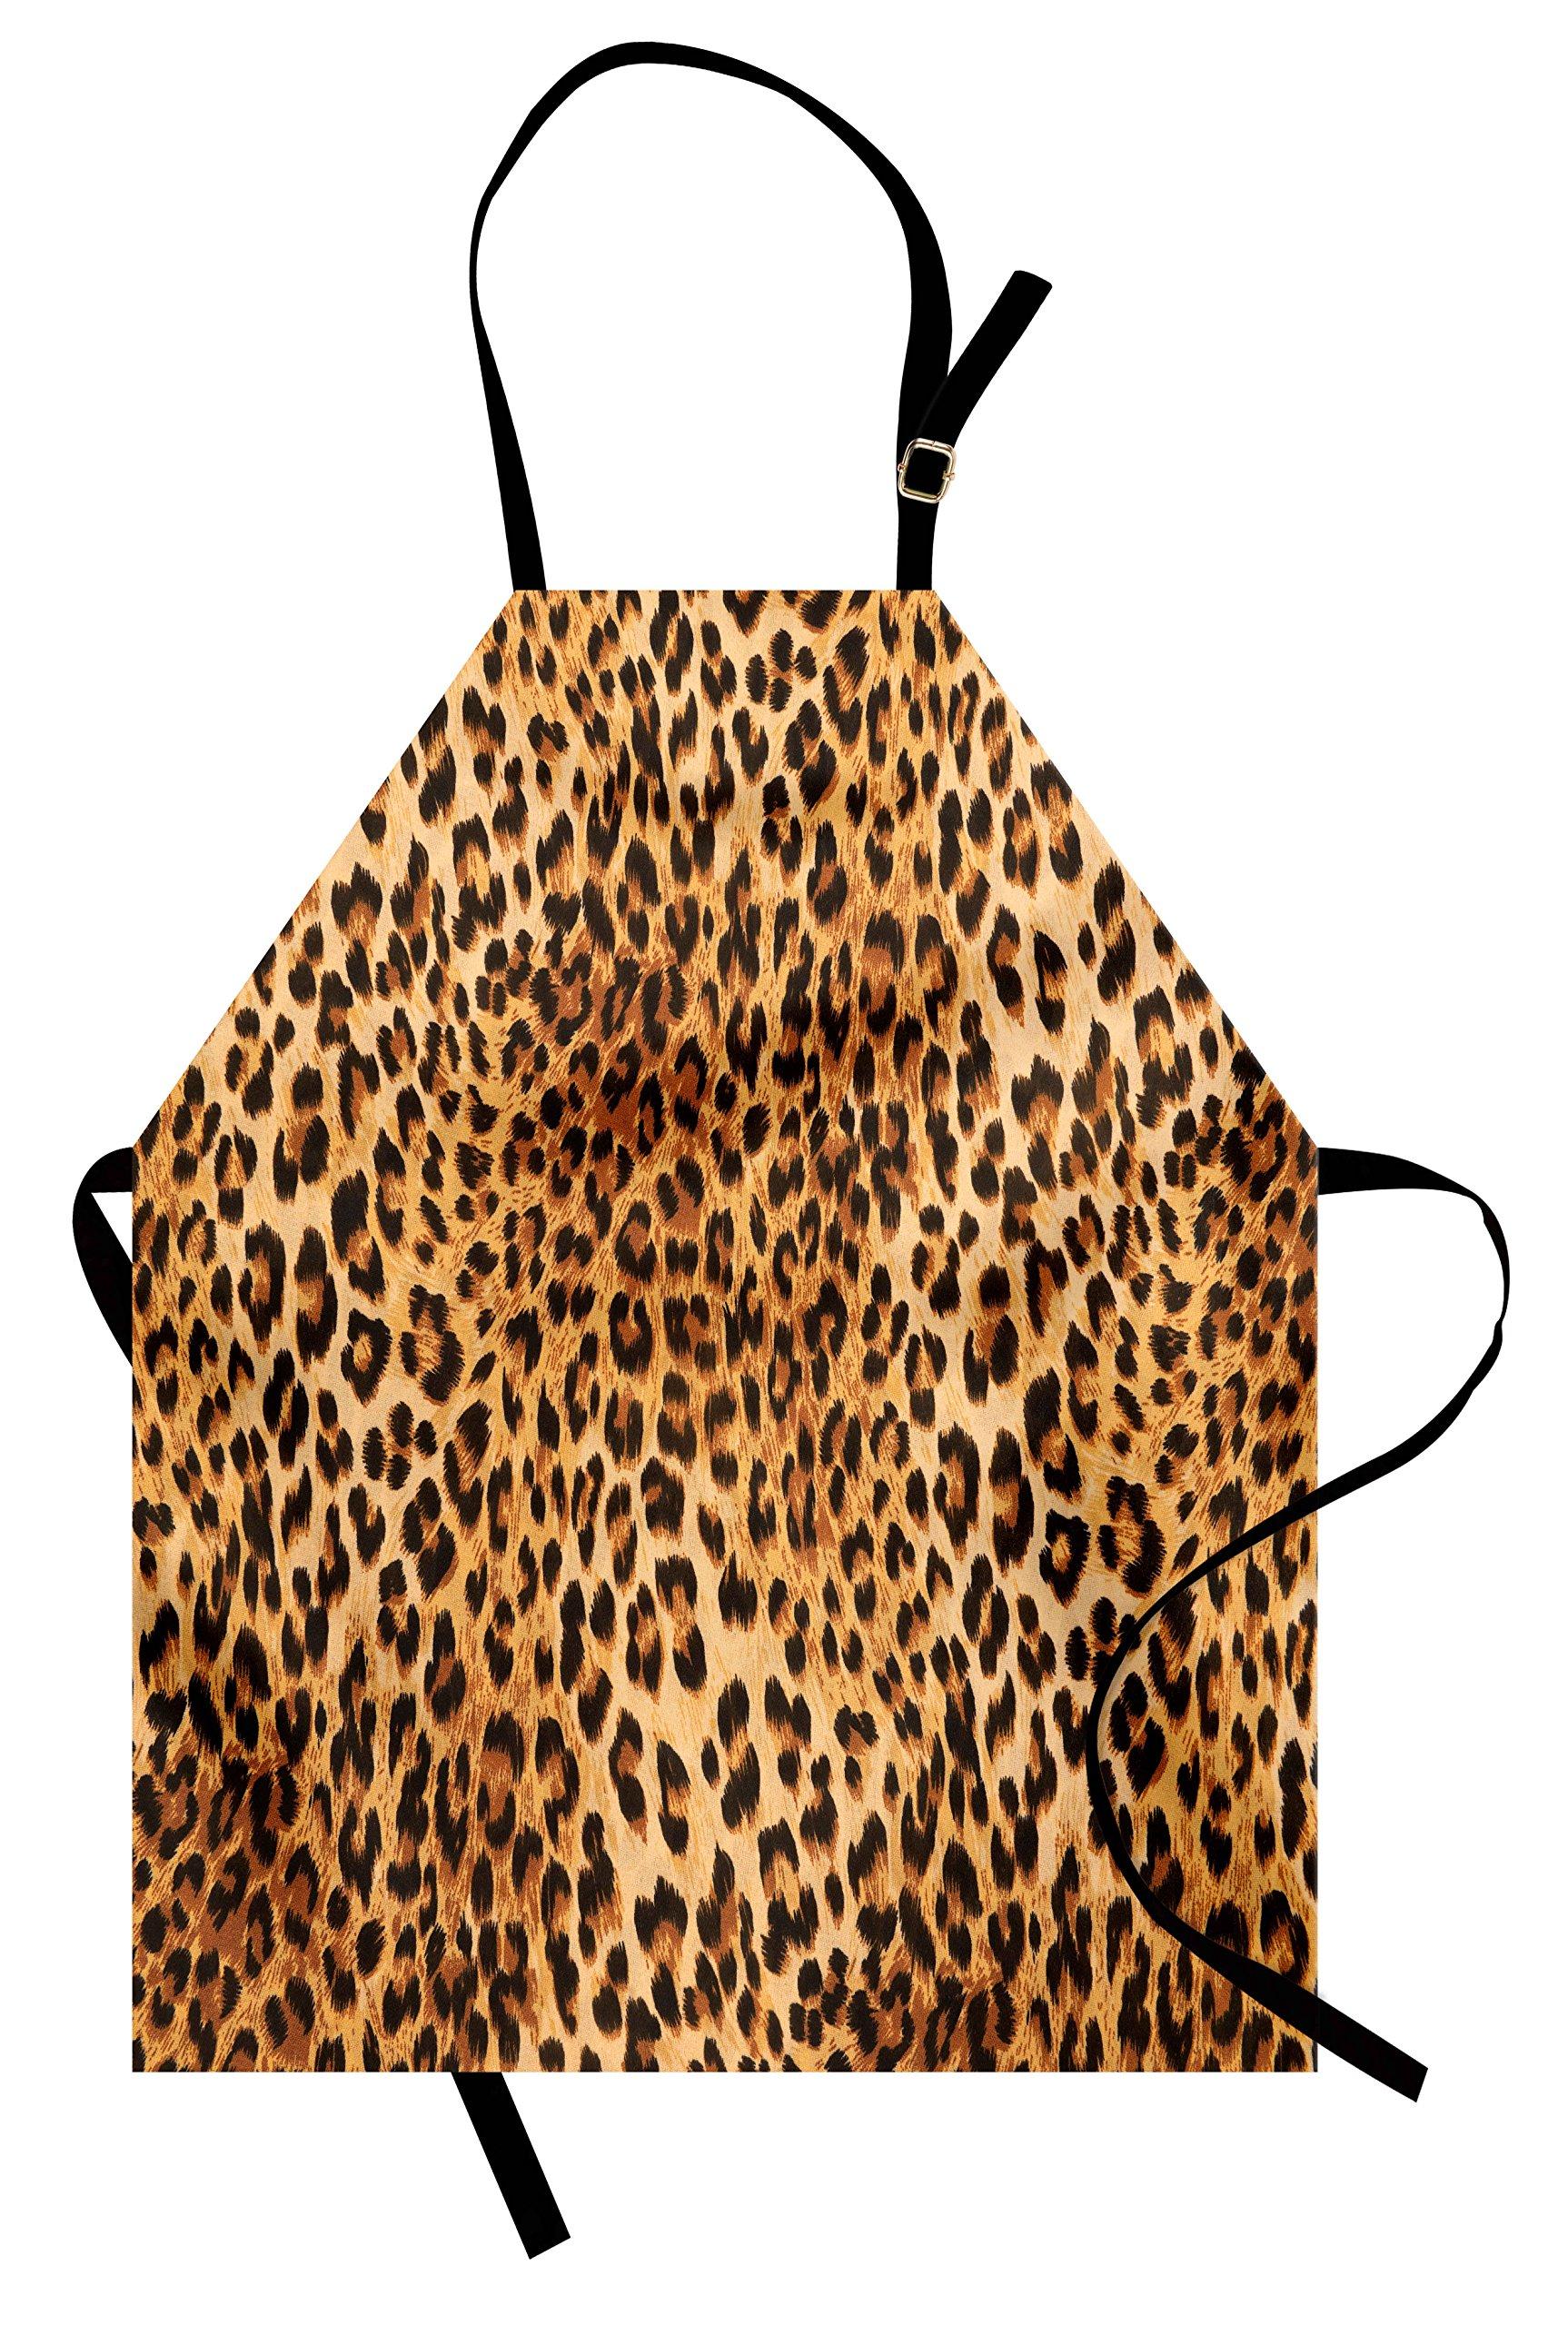 Lunarable Animal Print Apron, Wild Animal Leopard Skin Pattern Wildlife Nature Inspired Modern Illustration, Unisex Kitchen Bib Apron with Adjustable Neck for Cooking Baking Gardening, Sand Brown